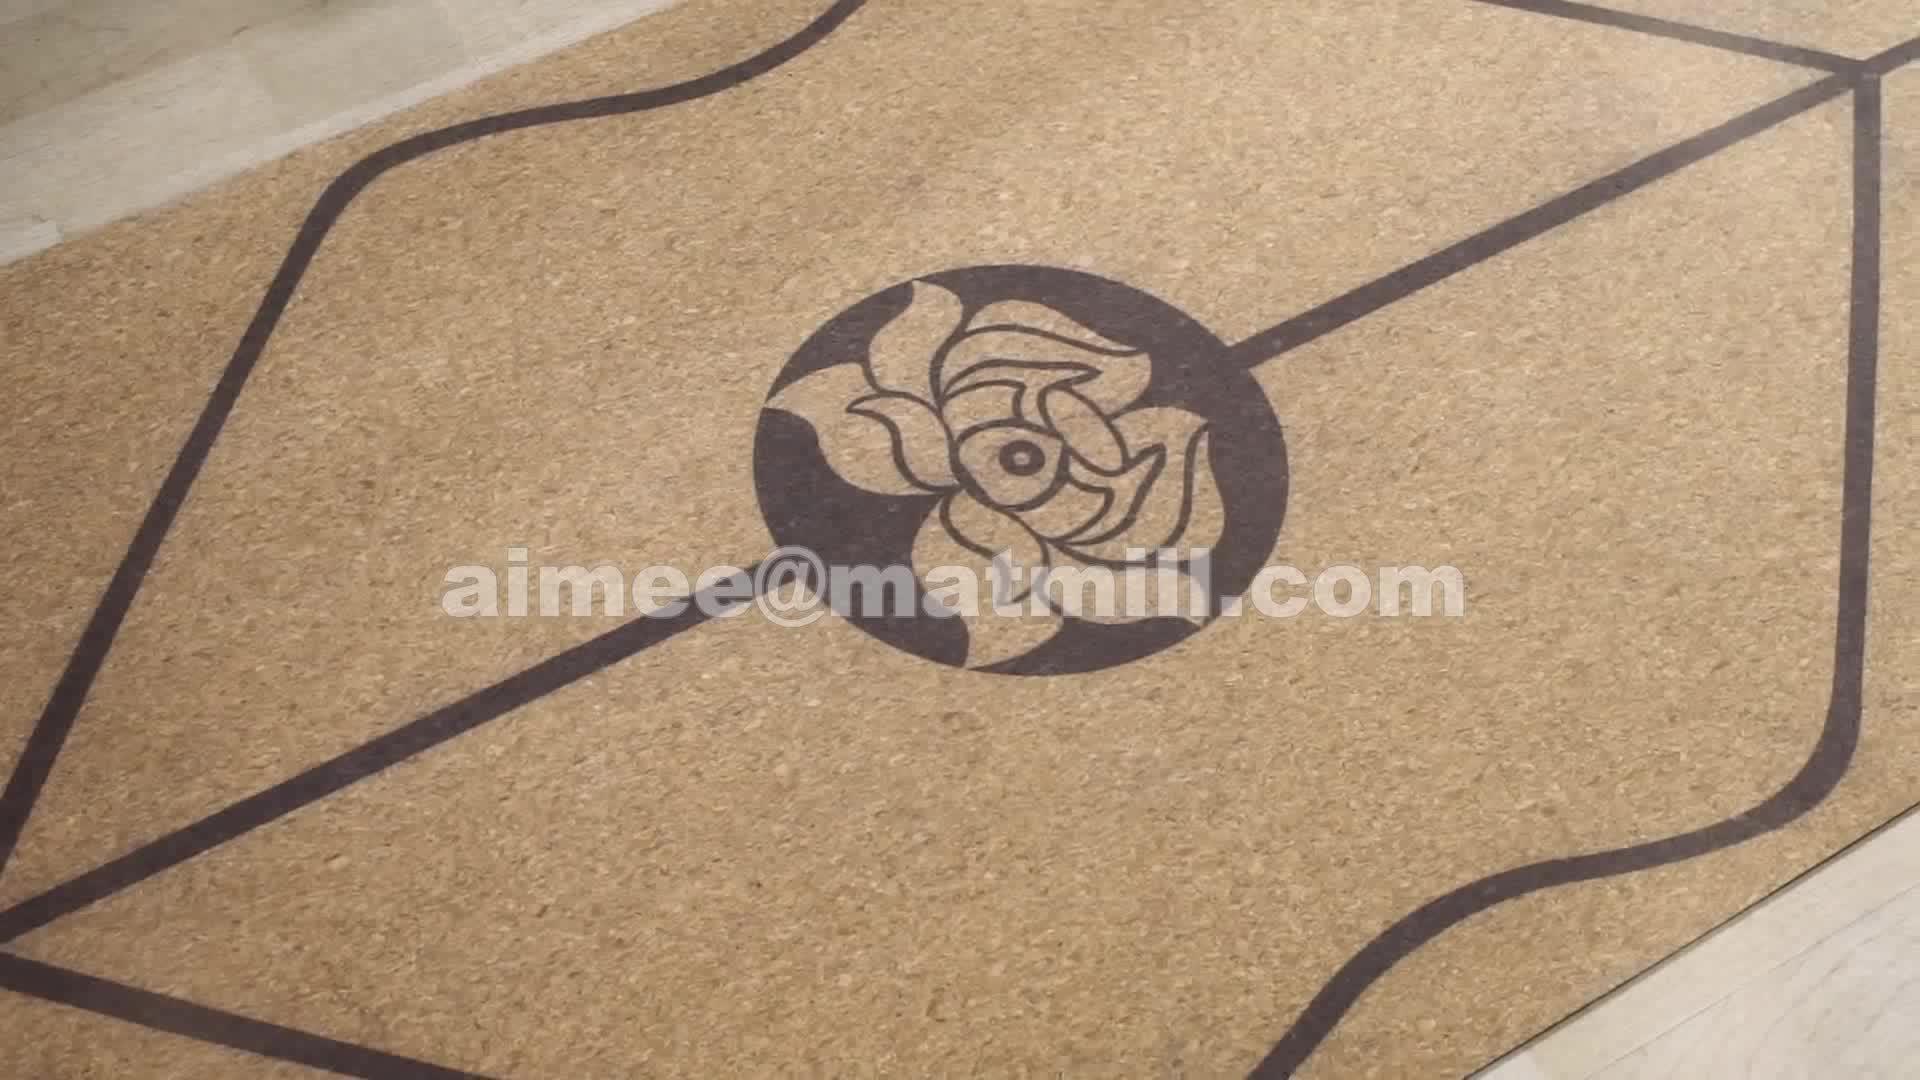 Full color sublimation printing natural tree rubber cork organic yoga mat